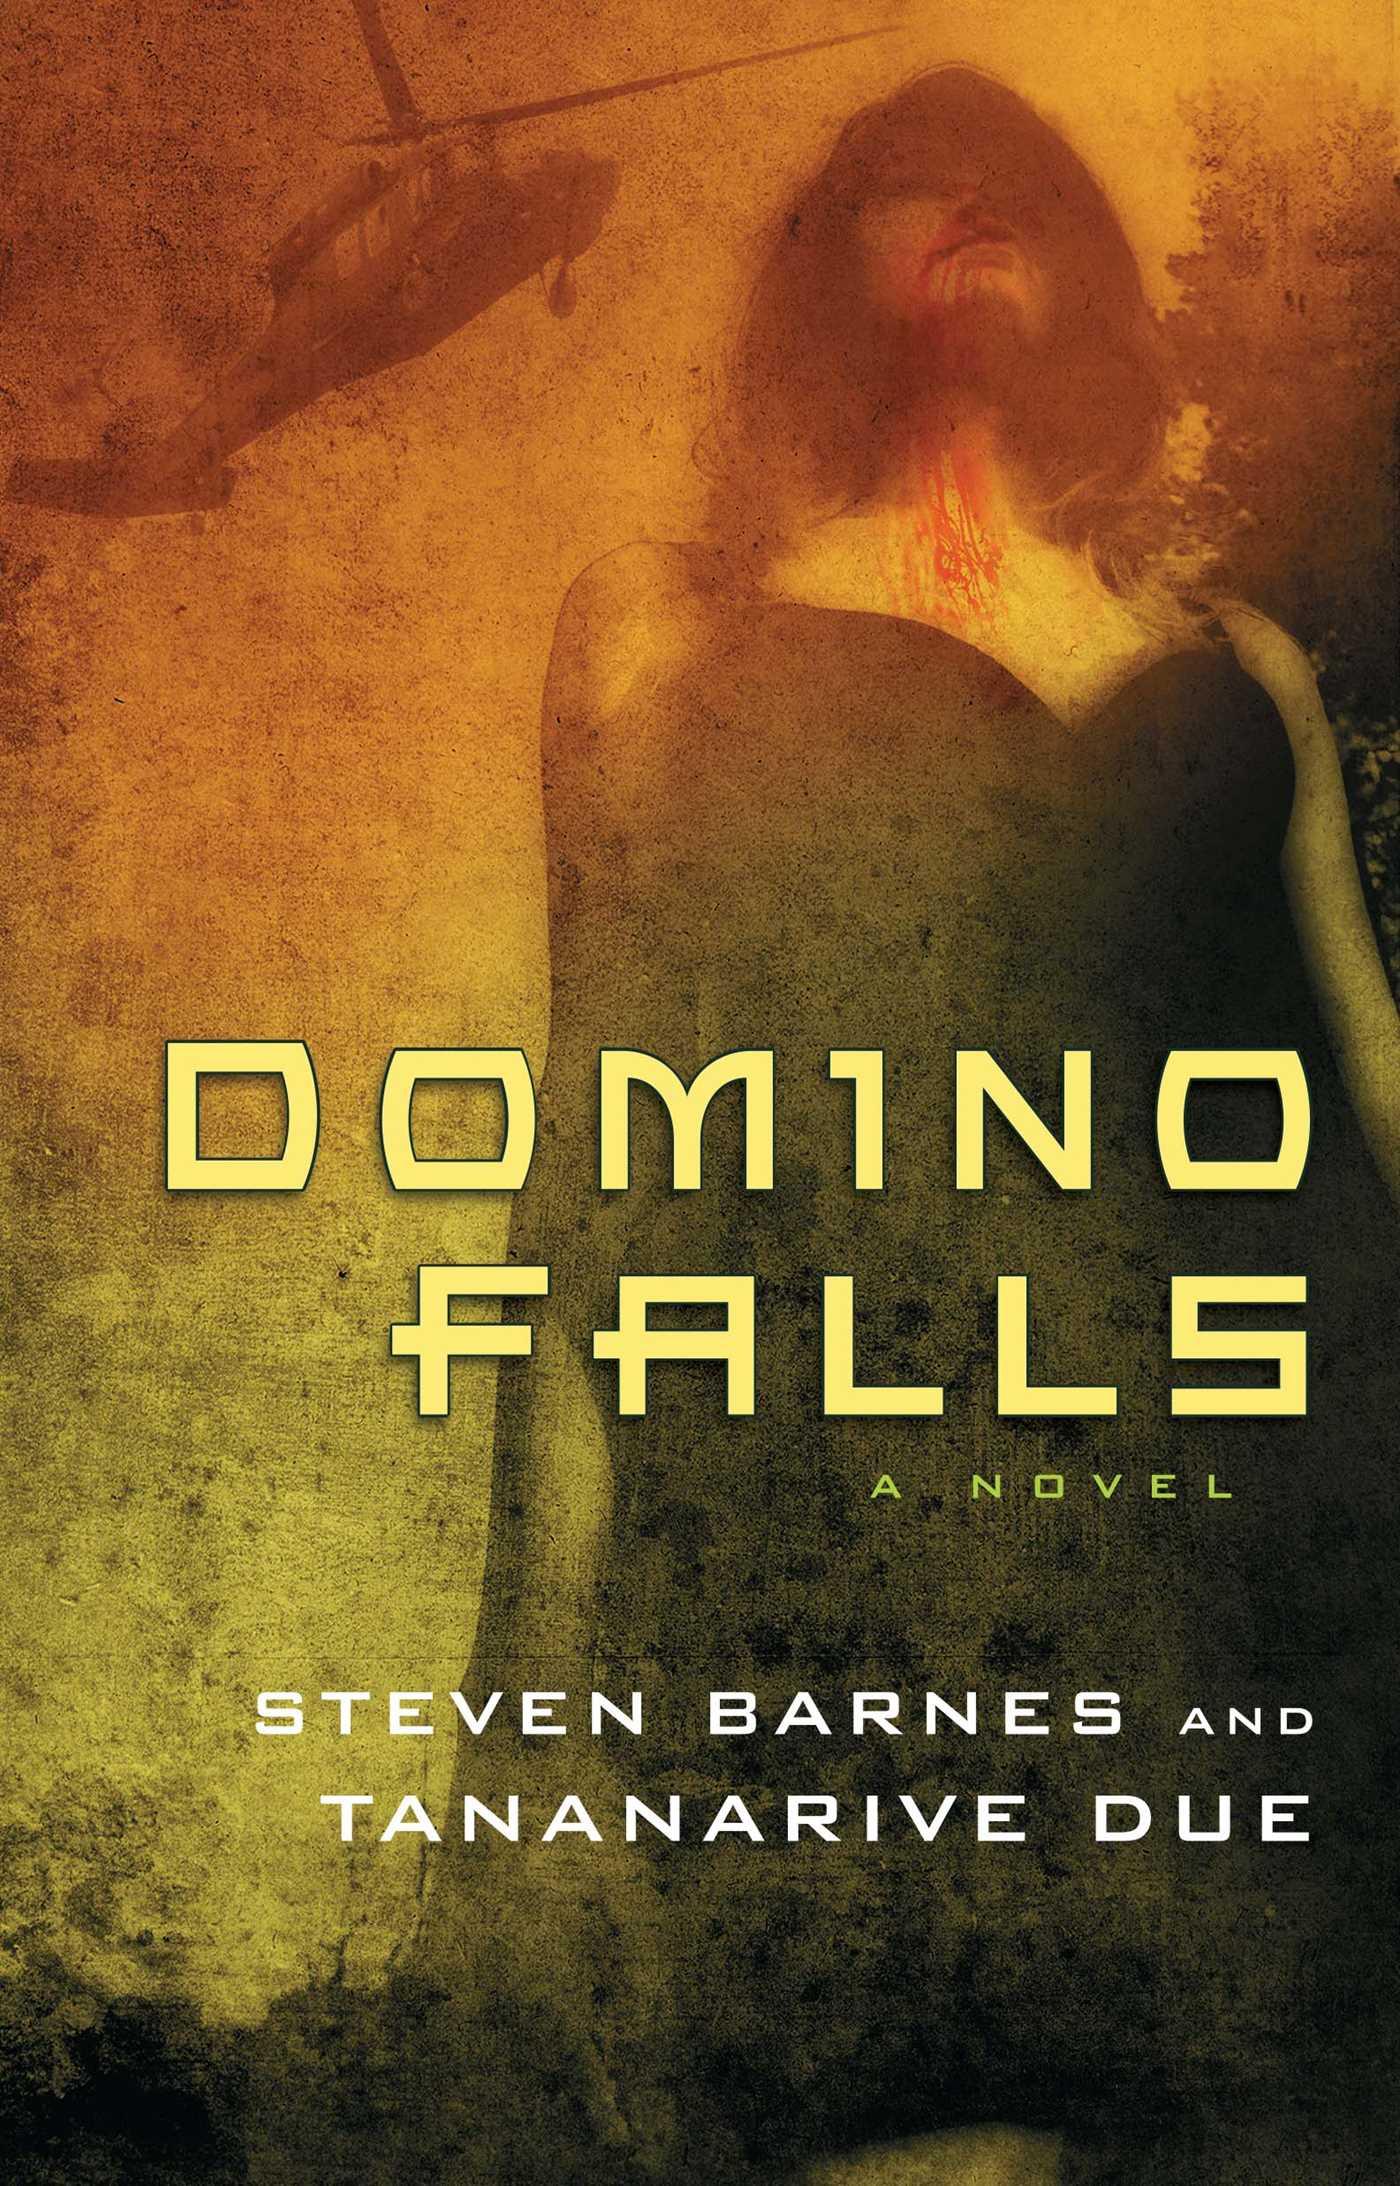 Domino falls 9781451617023 hr